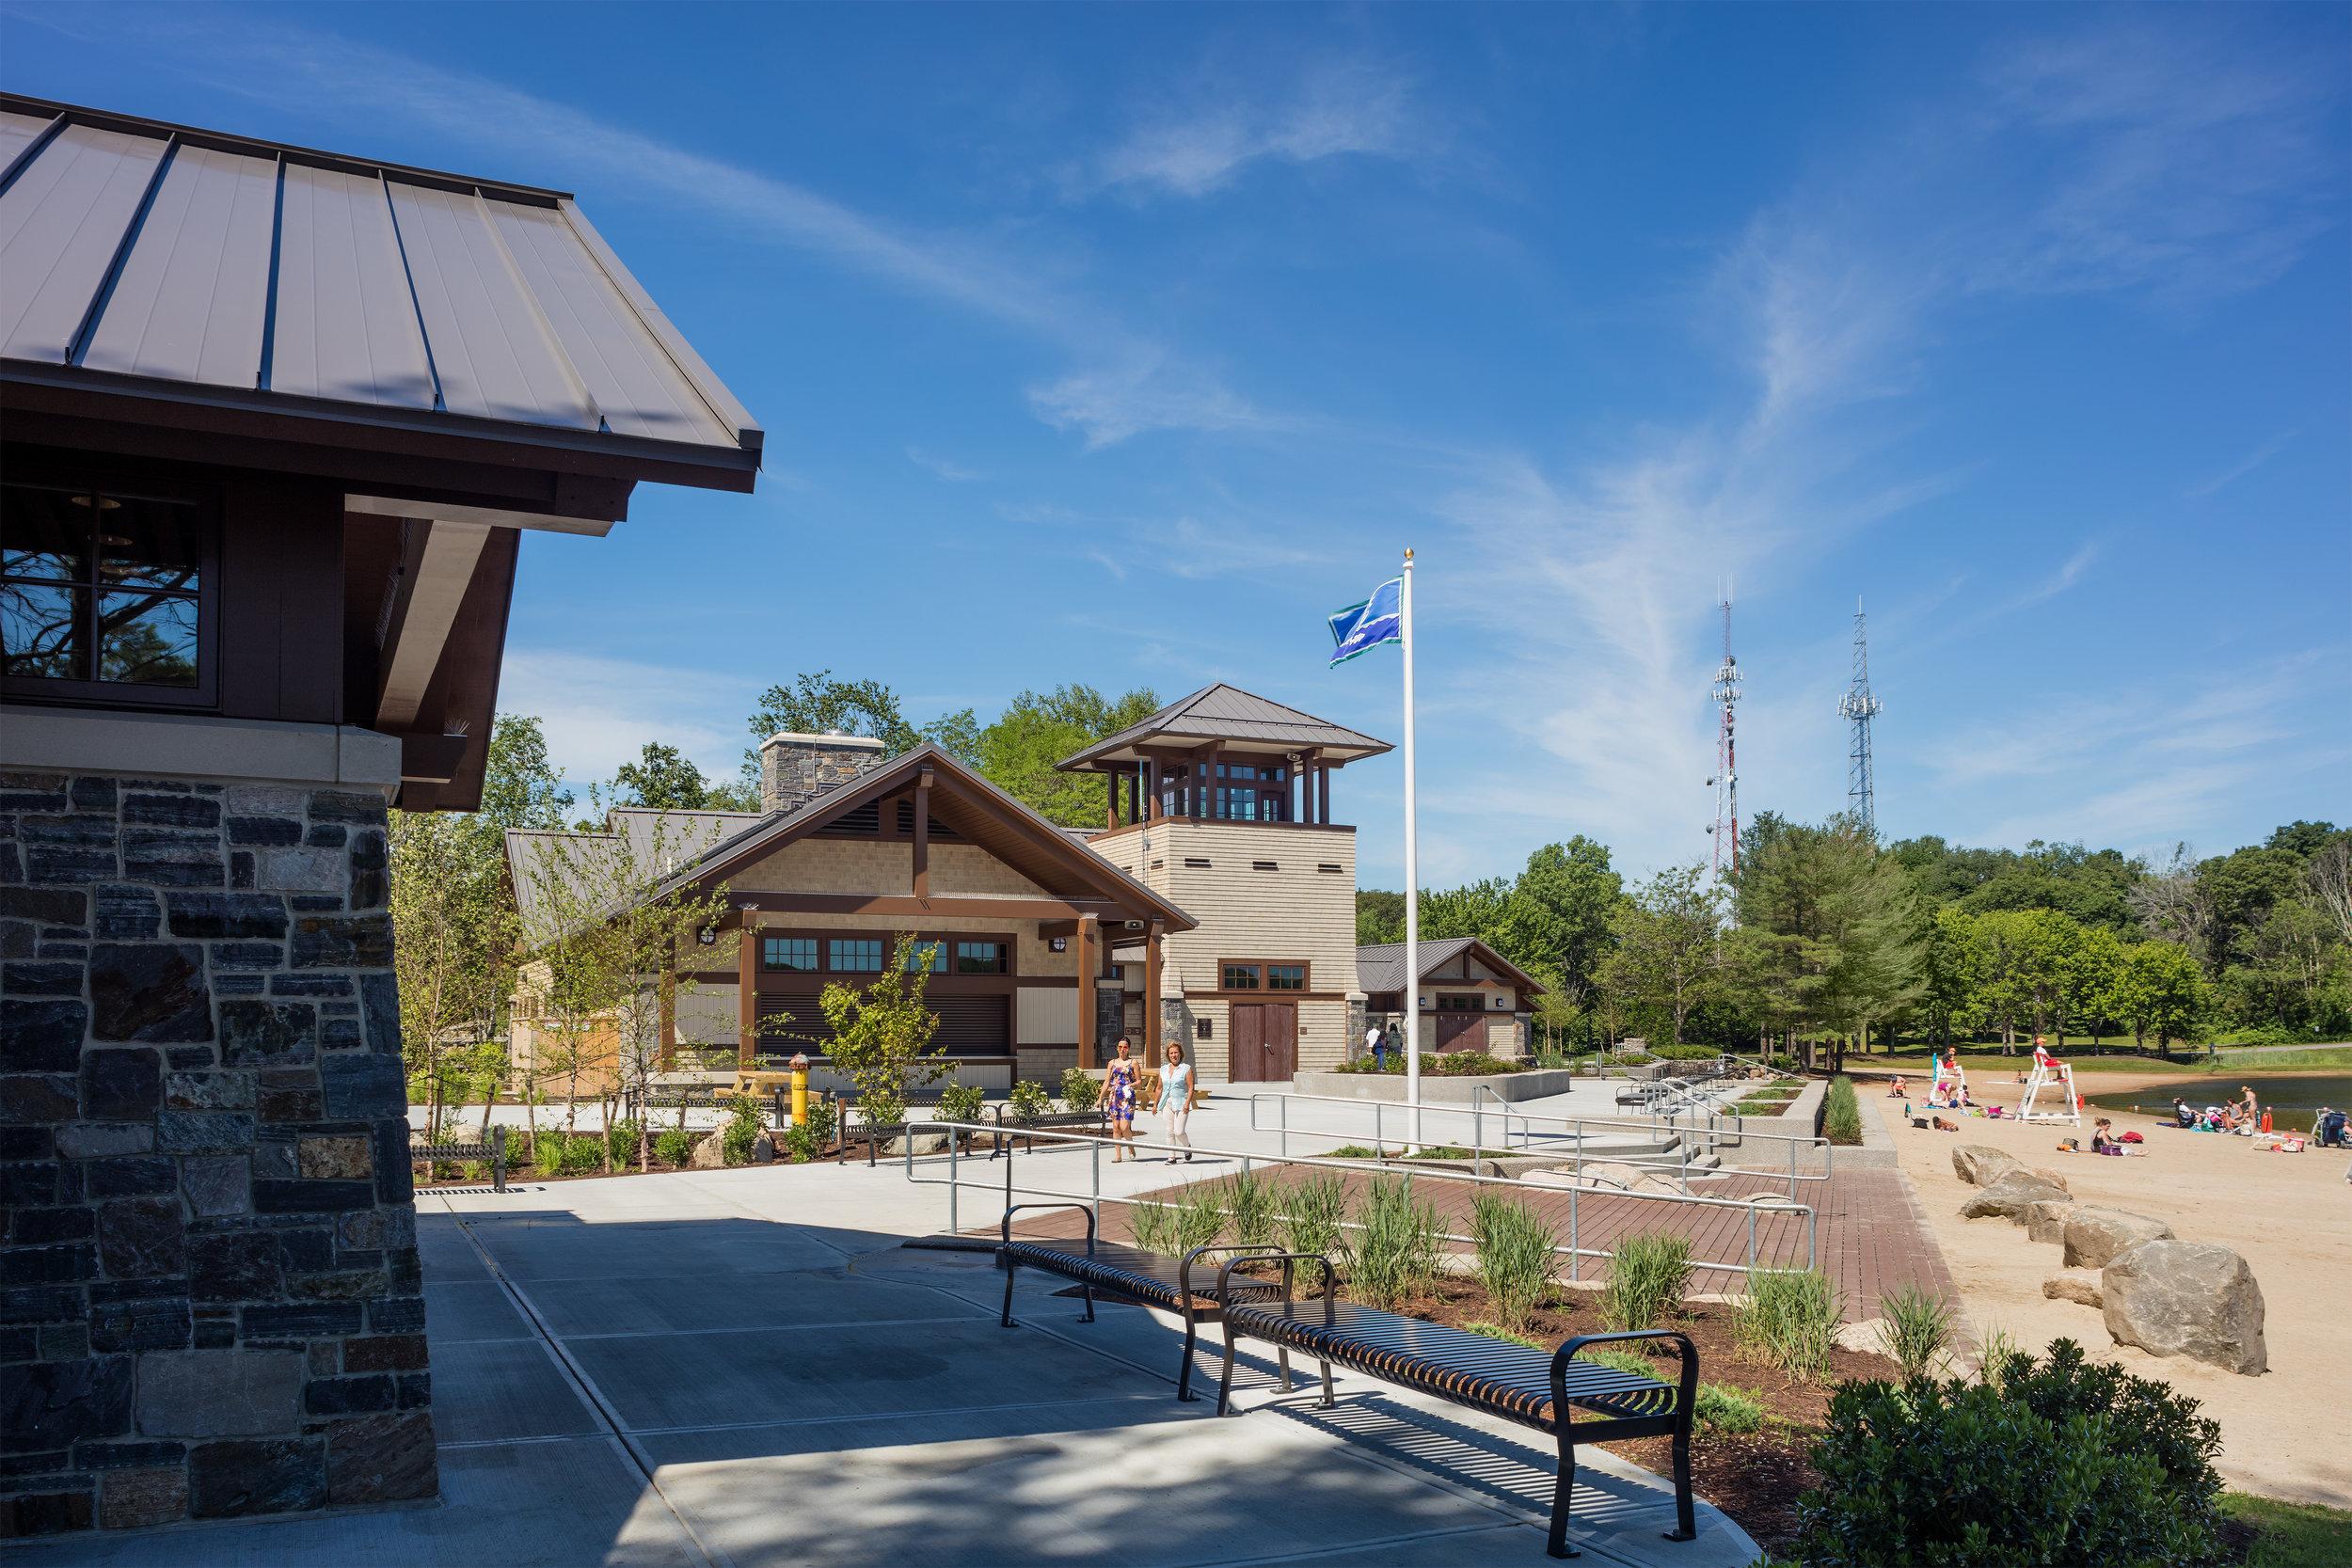 Lincoln Woods State Park Beach Pavilion Complex